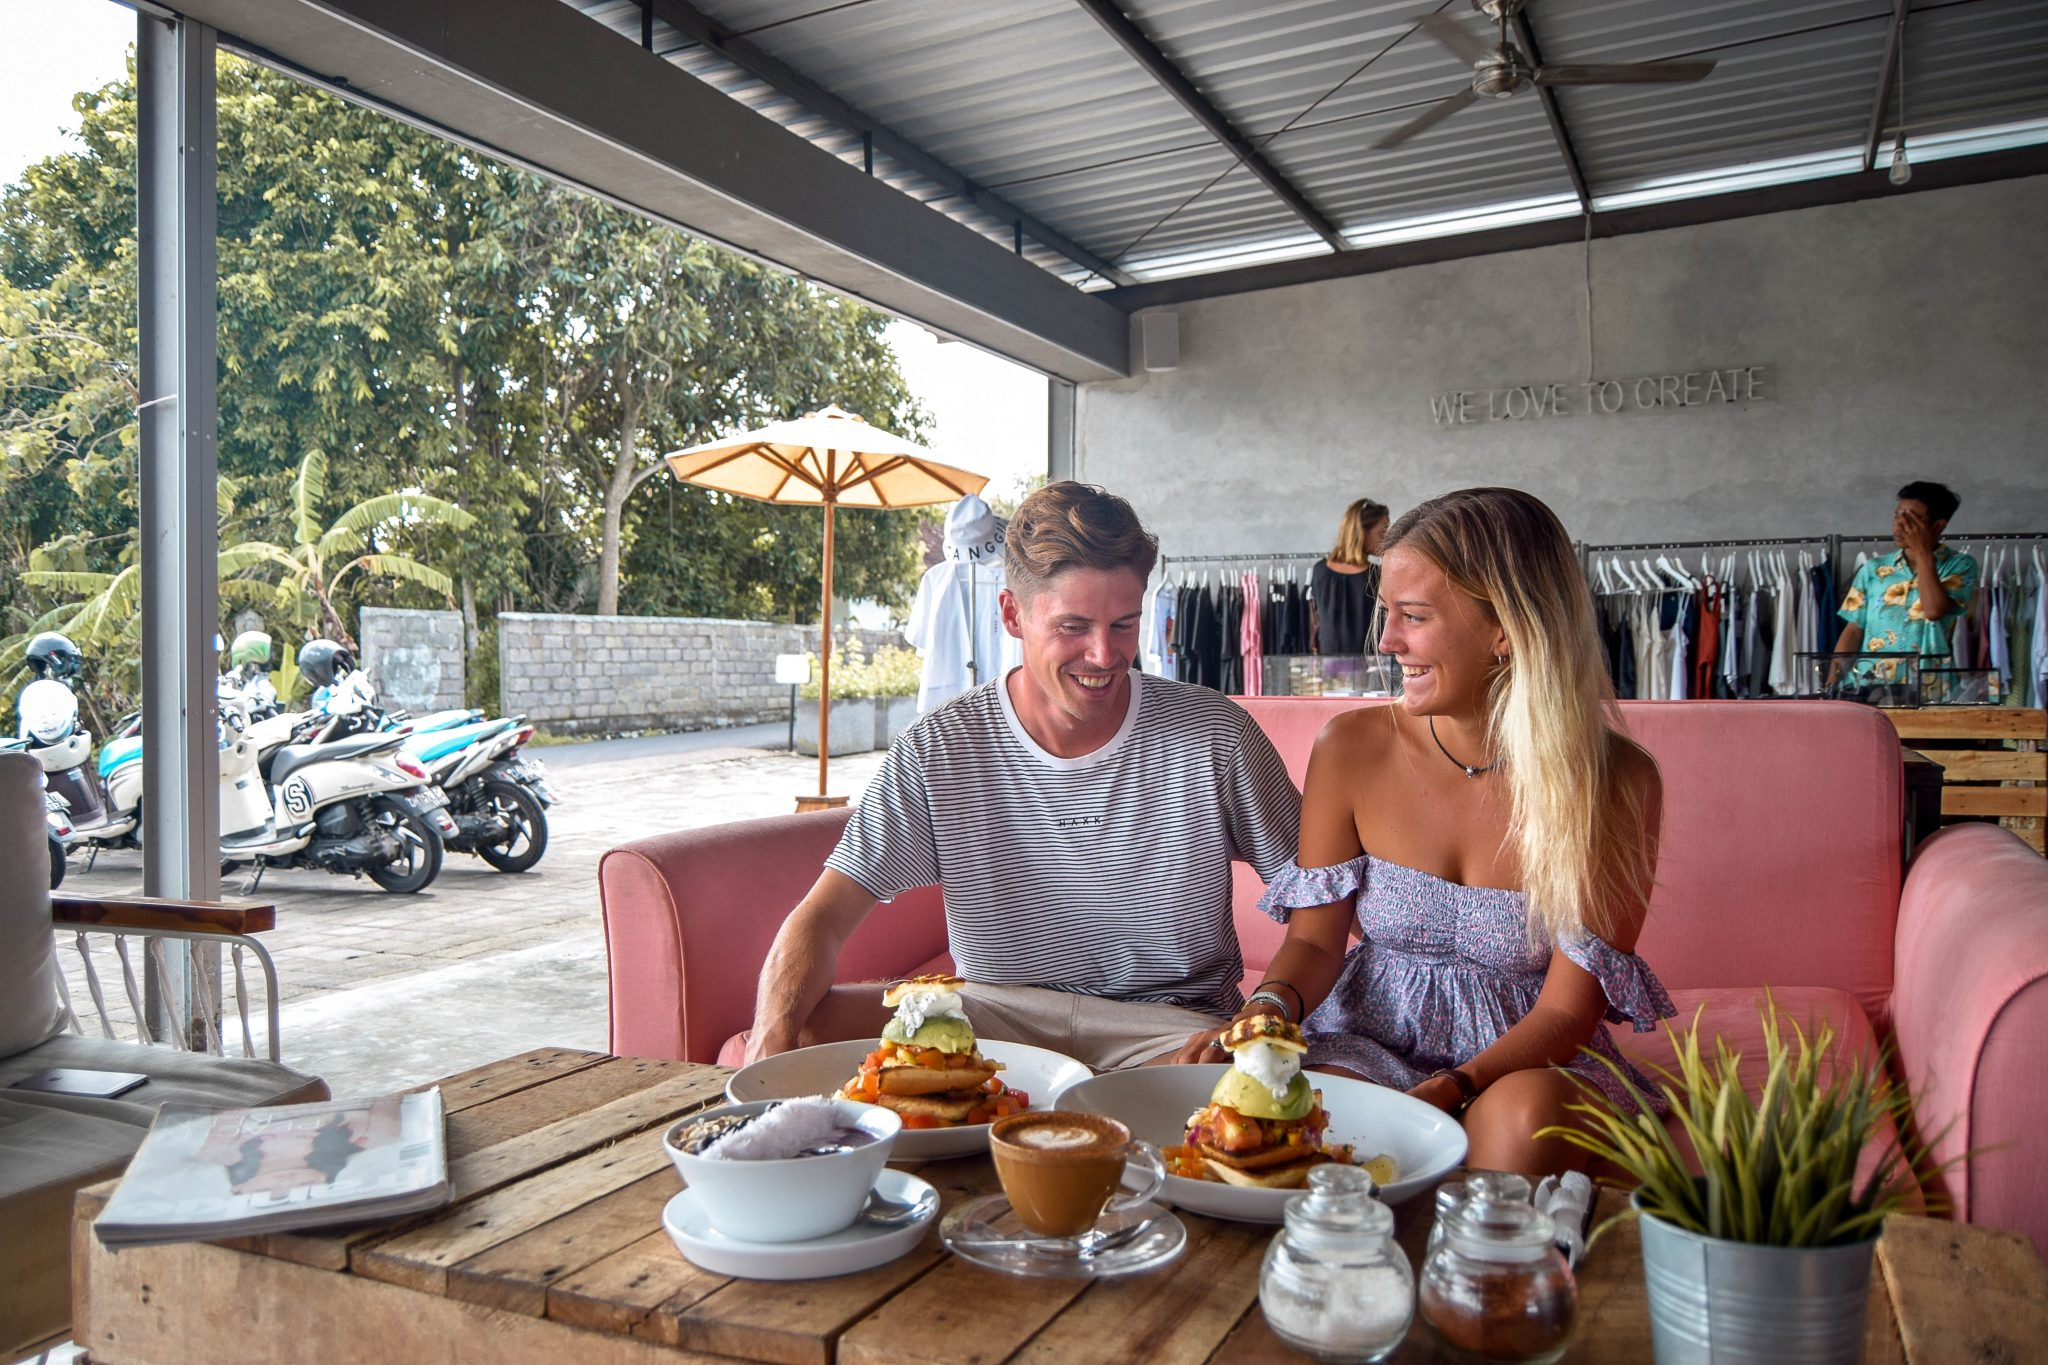 Wanderers & Warriors - Charlie & Lauren UK Travel Couple - The Crate Cafe Canggu - Best Restaurants In Canggu Restaurants